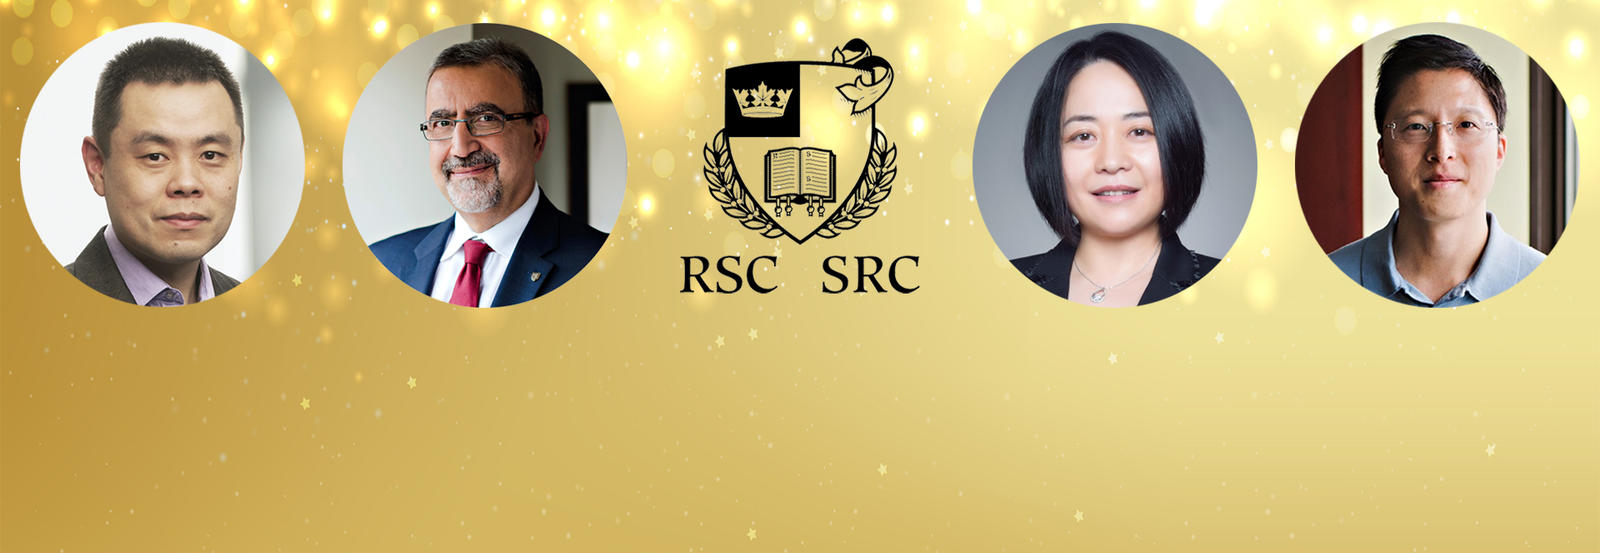 Winners of RSC awards